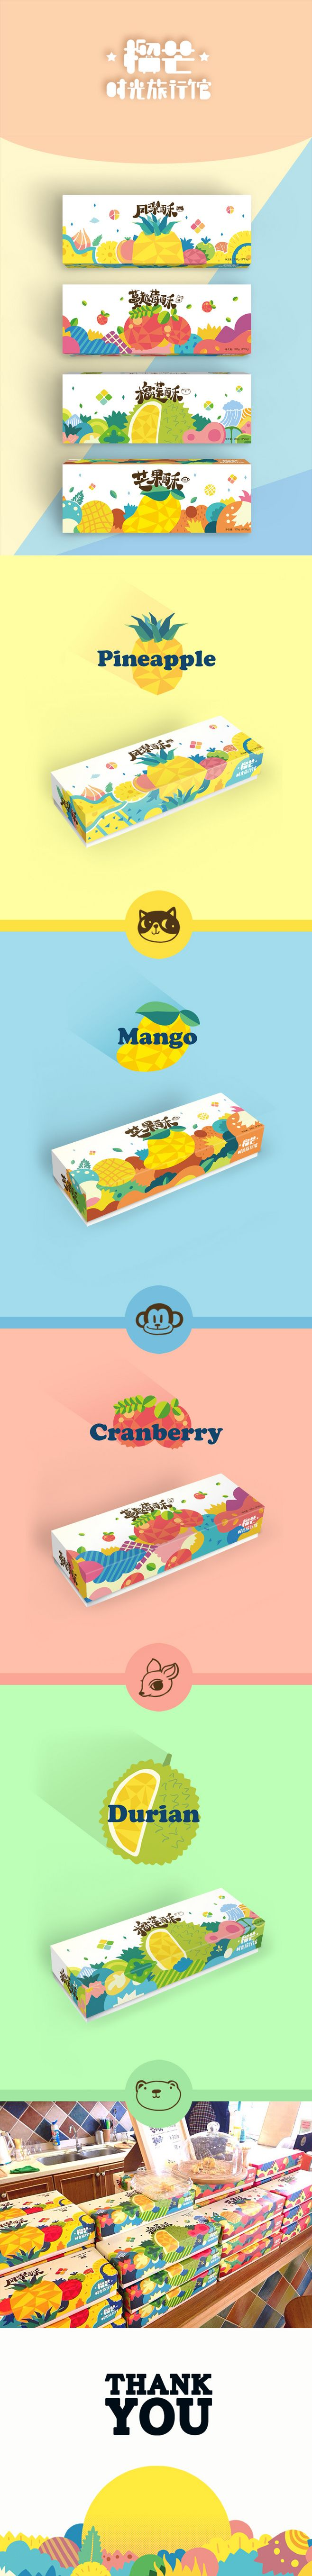 《一套小清新的酥饼包装》|包装|平面|林.... Let's have some cake. PD